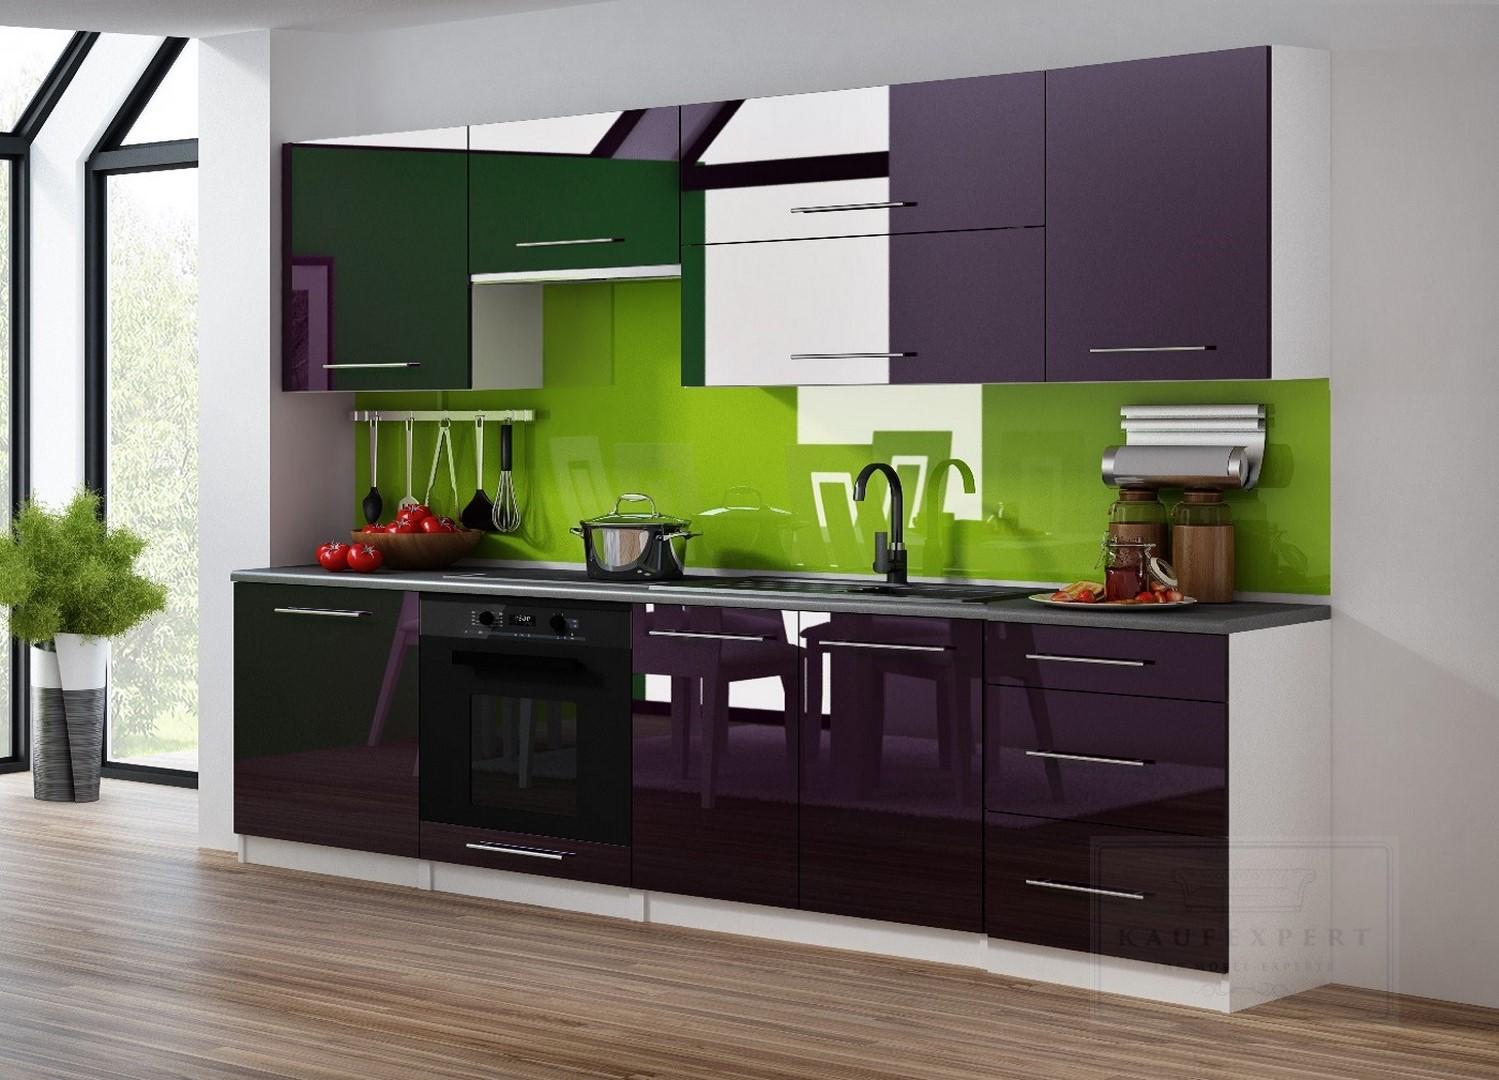 k chenzeile linda 240 cm k chenblock einbauk che relinggriffe grau hochglanz ovp ebay. Black Bedroom Furniture Sets. Home Design Ideas